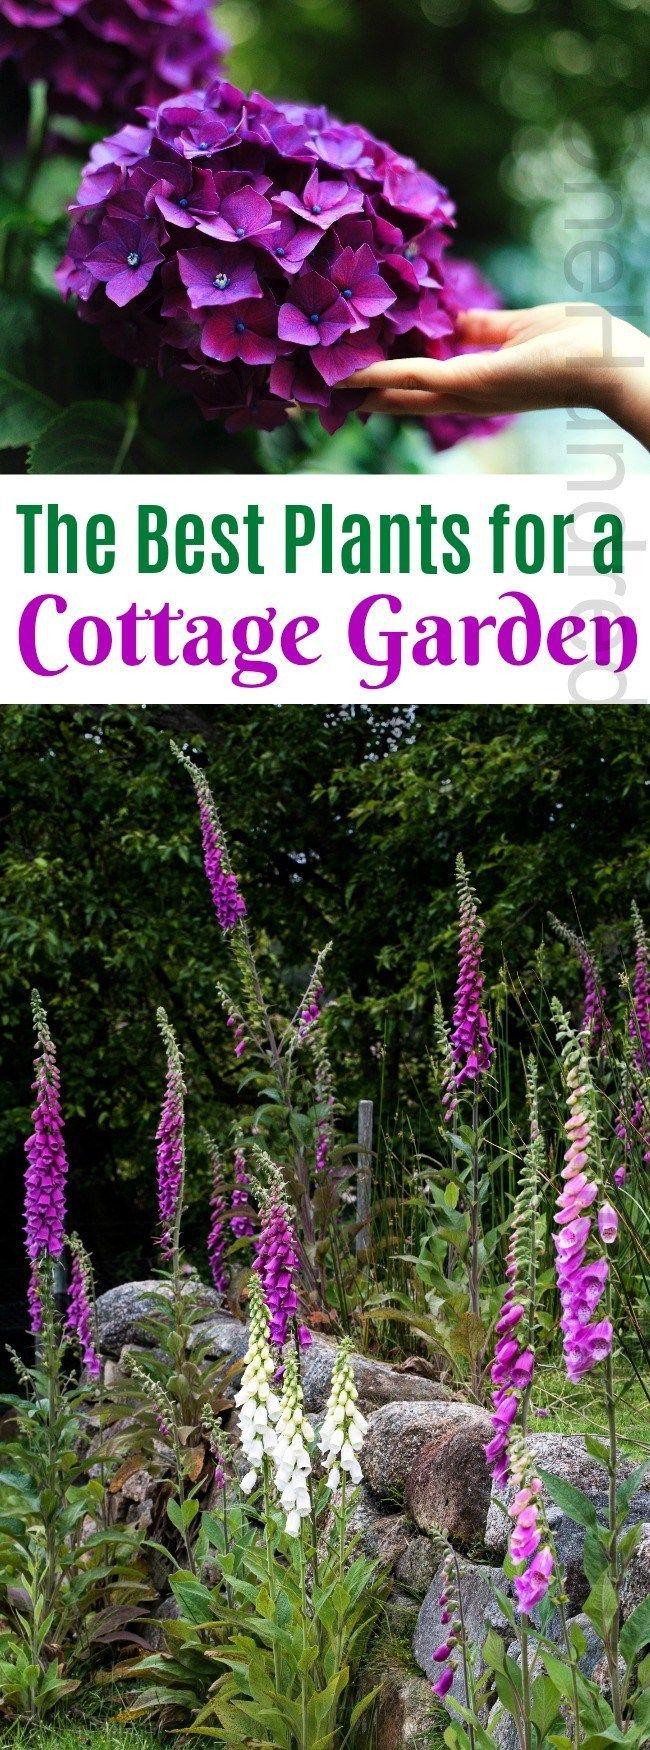 The Best Plants for a Cottage Garden Cottage Garden Cottage Garden Ideas Gardening Flowers for Cottage Garden